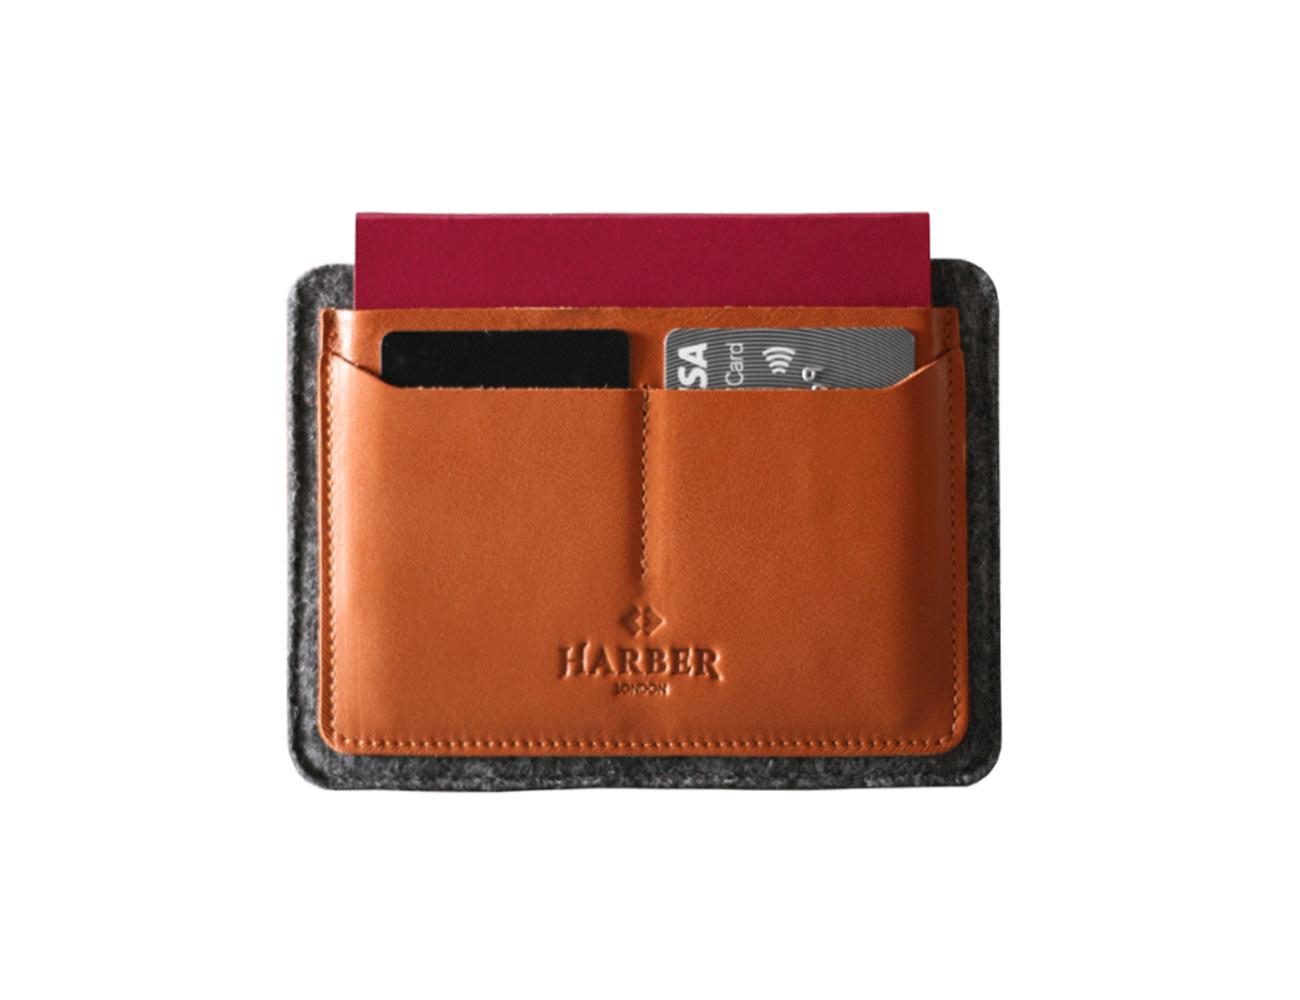 Haber London Flat Leather Passport Holder